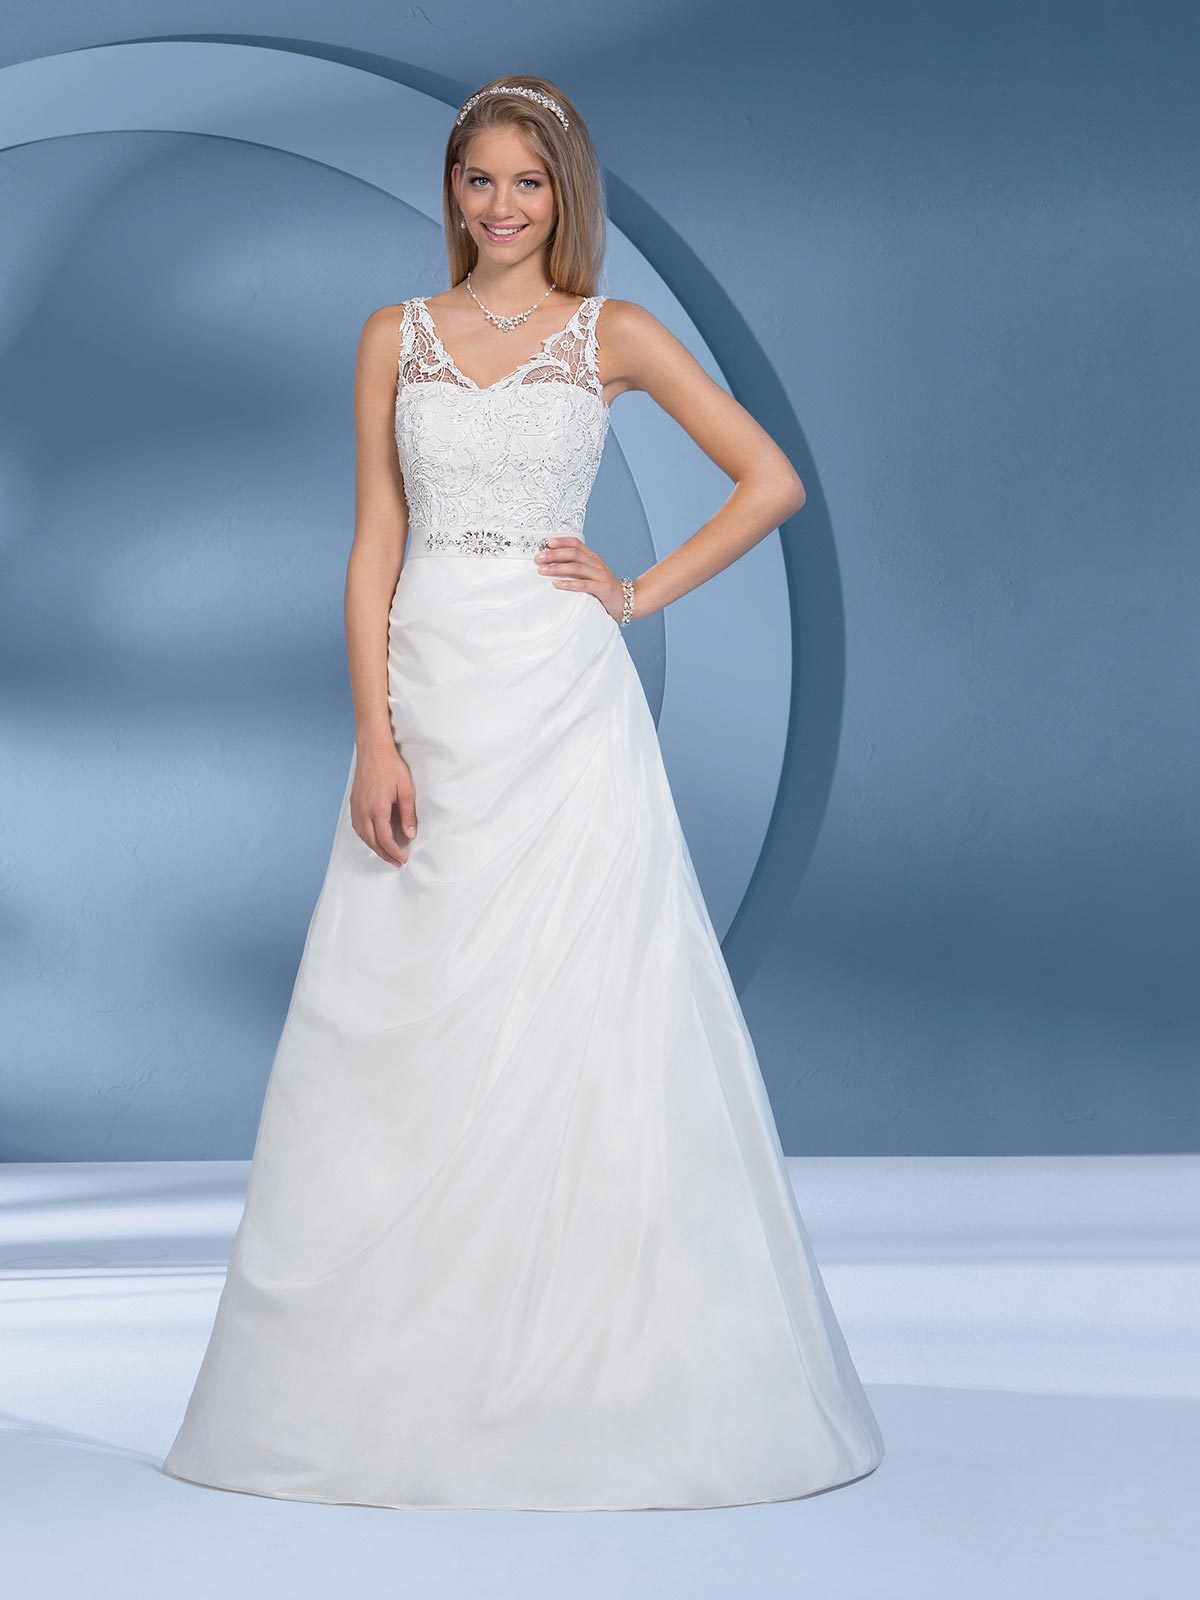 Brautkleid 13095 Arizona von Kleemeier auf Ja.de